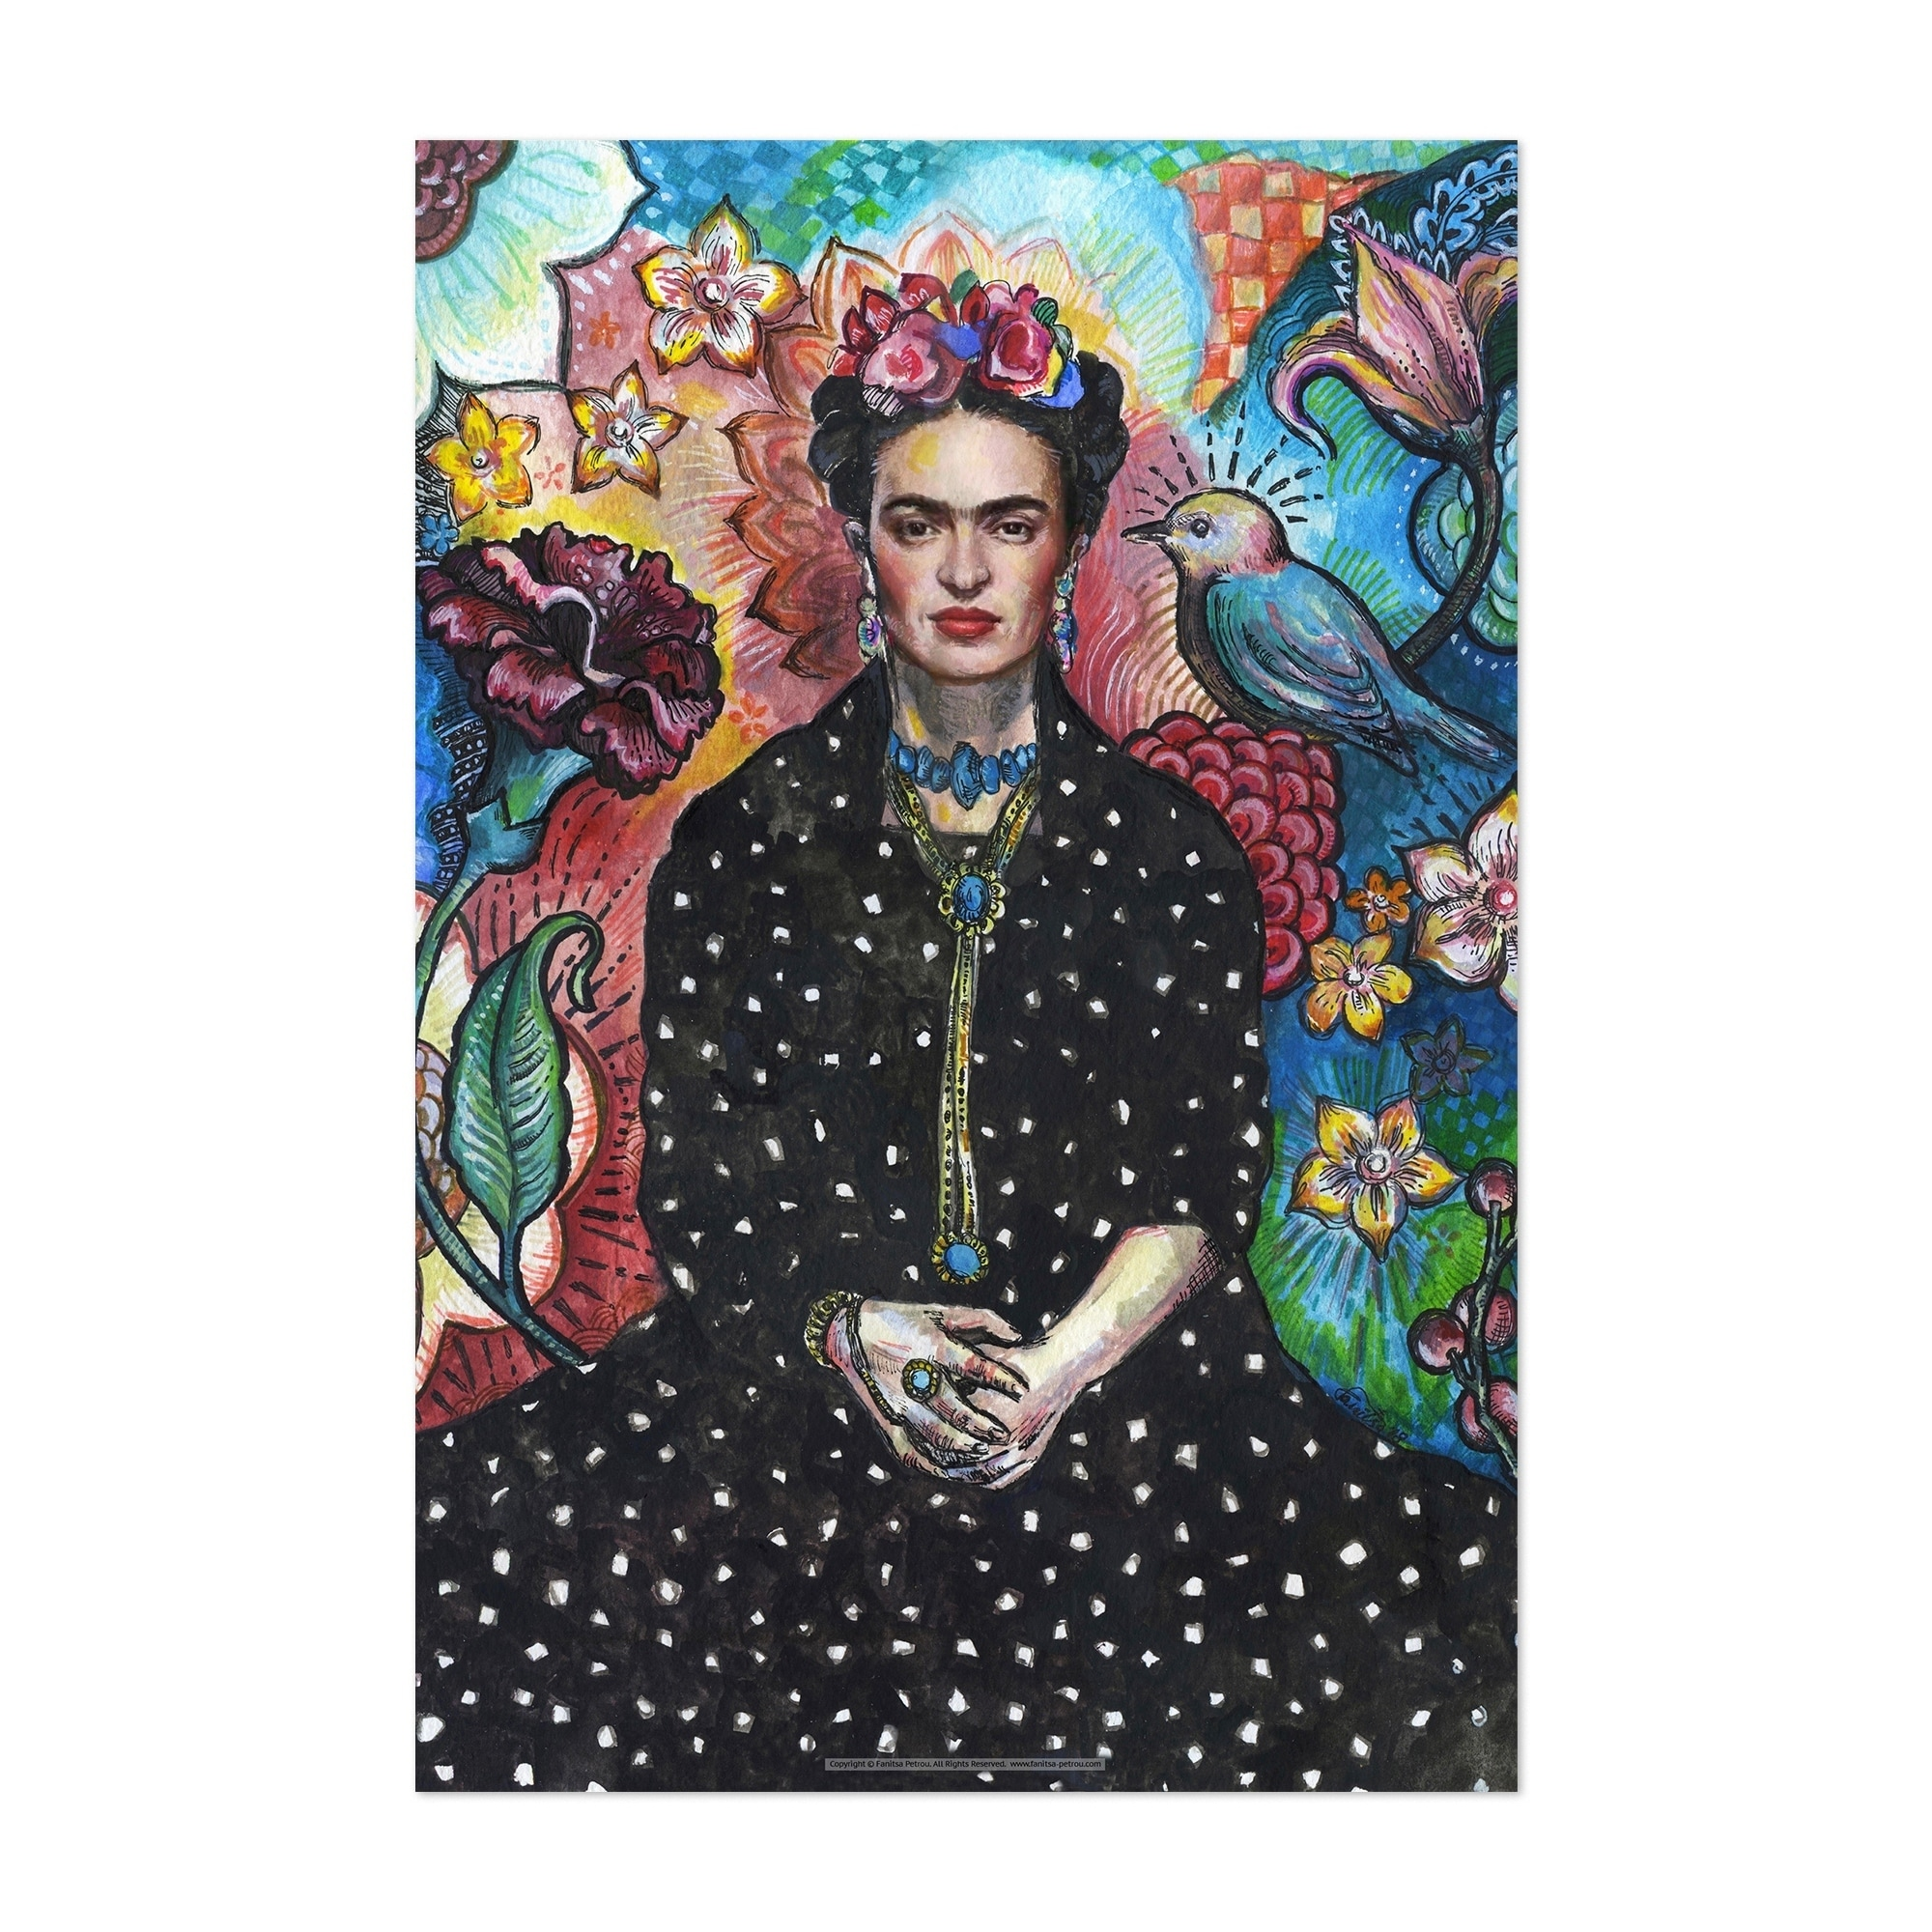 Art Print Poster Canvas FRIDA KAHLO IMAGE PICTURE